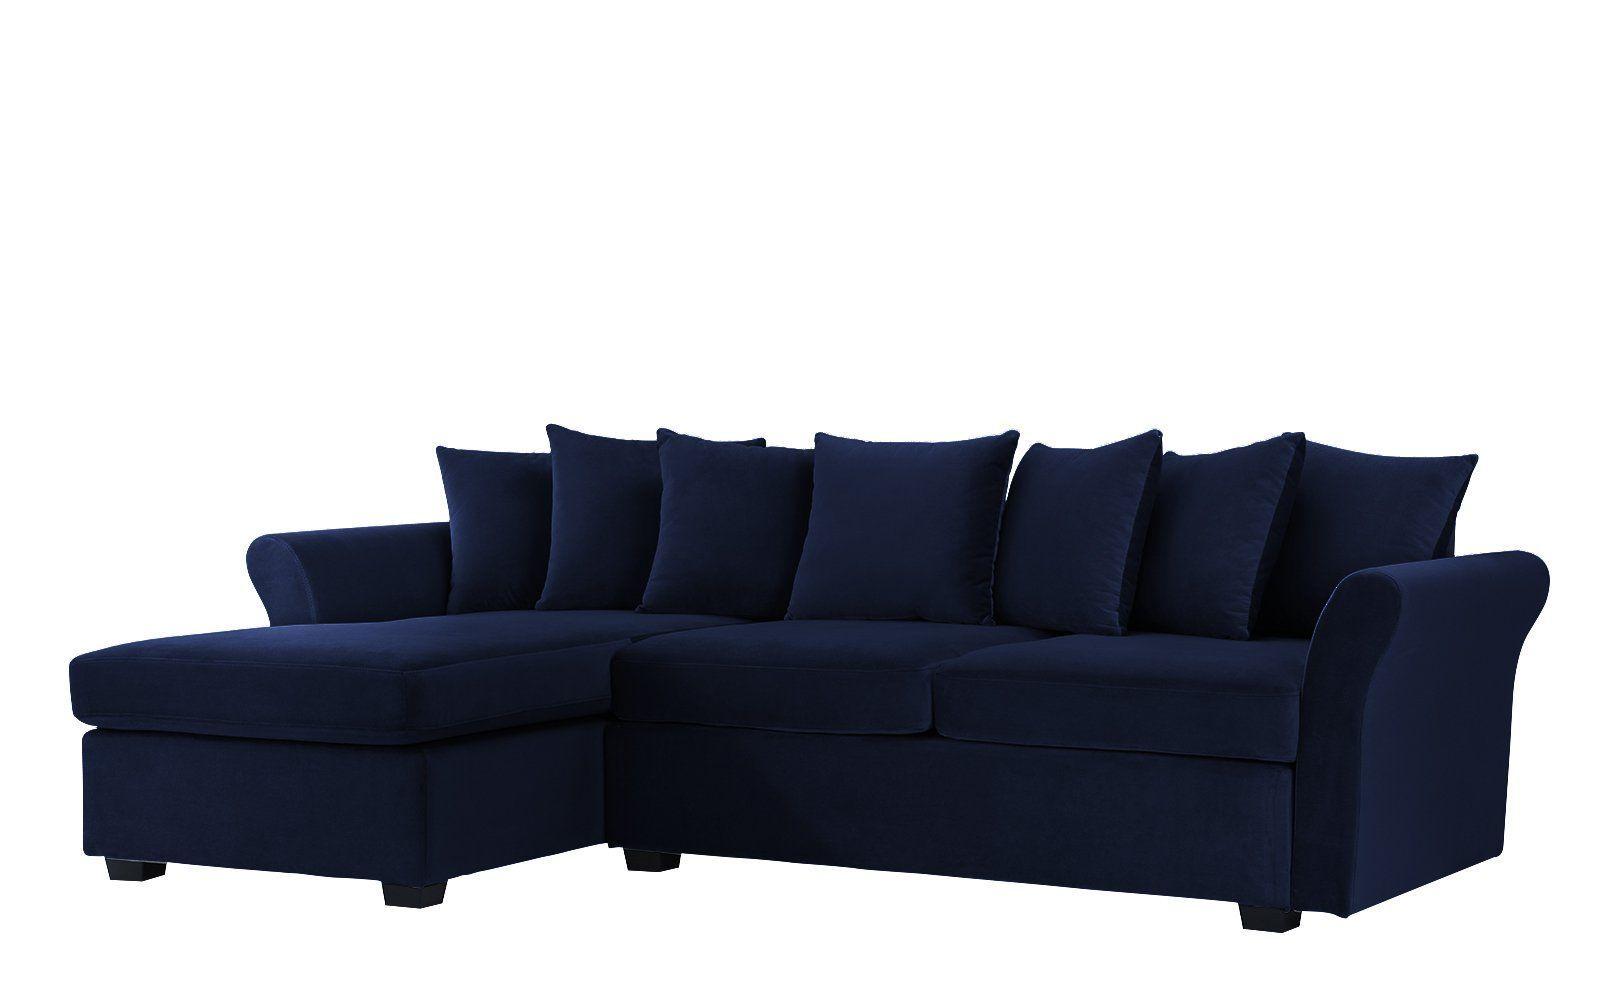 Astonishing Arendal Classic Victorian Inspired Velvet Sectional Sofa Download Free Architecture Designs Scobabritishbridgeorg